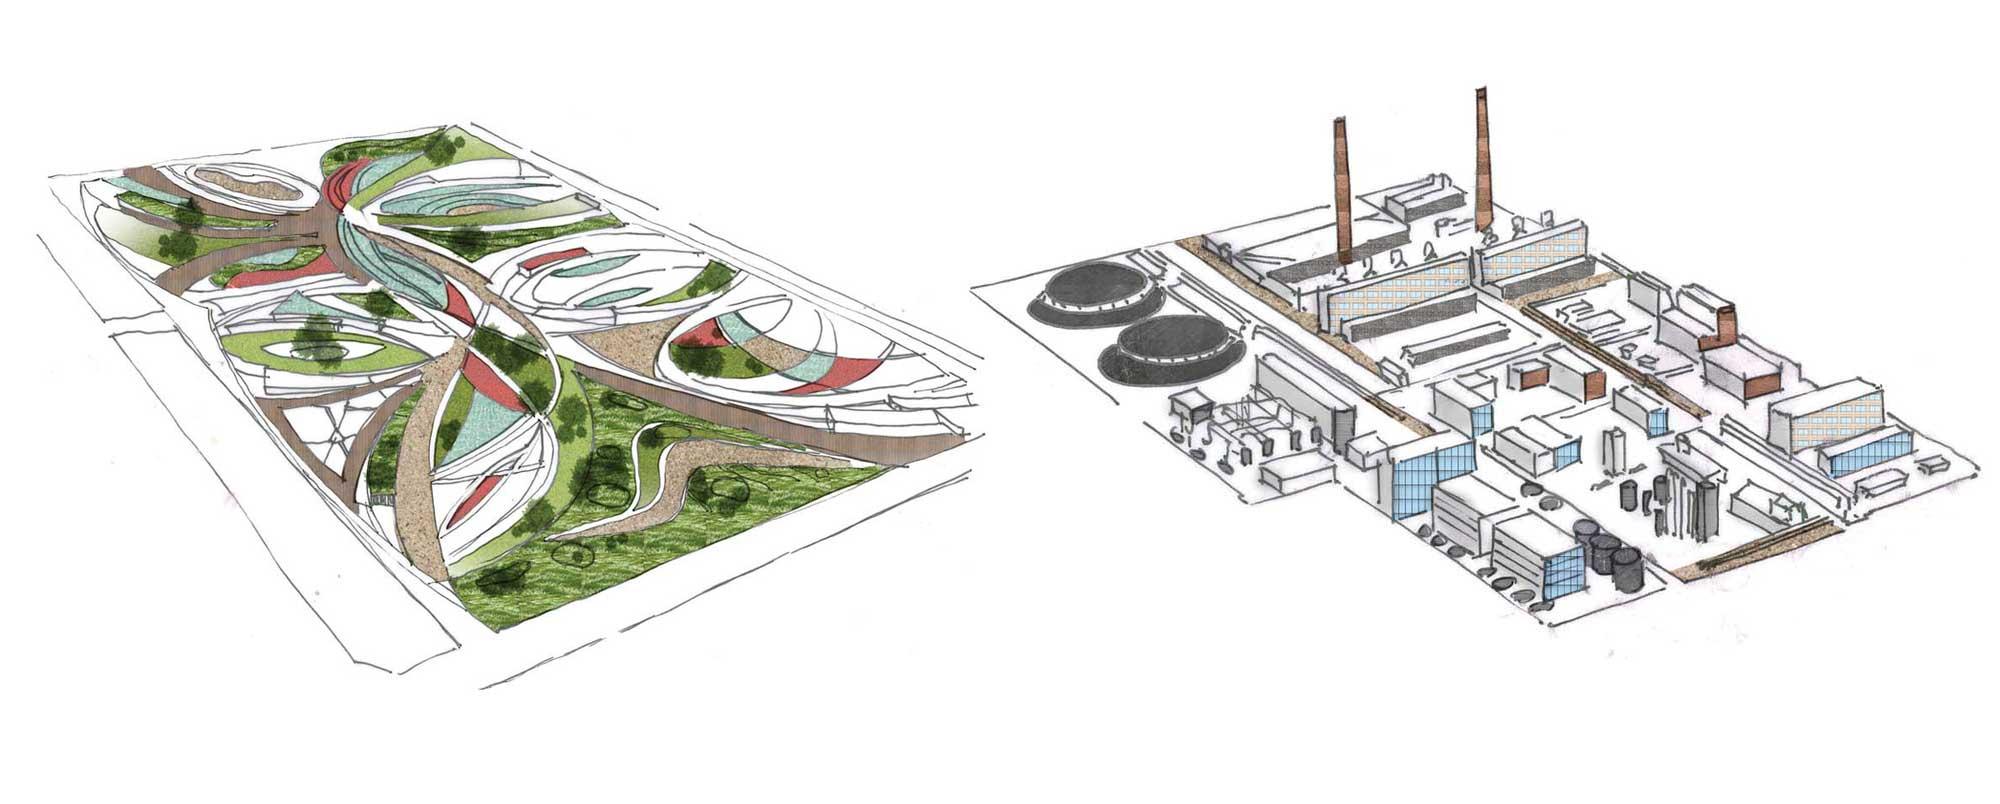 Zones description. Recreational zone | Industrial park